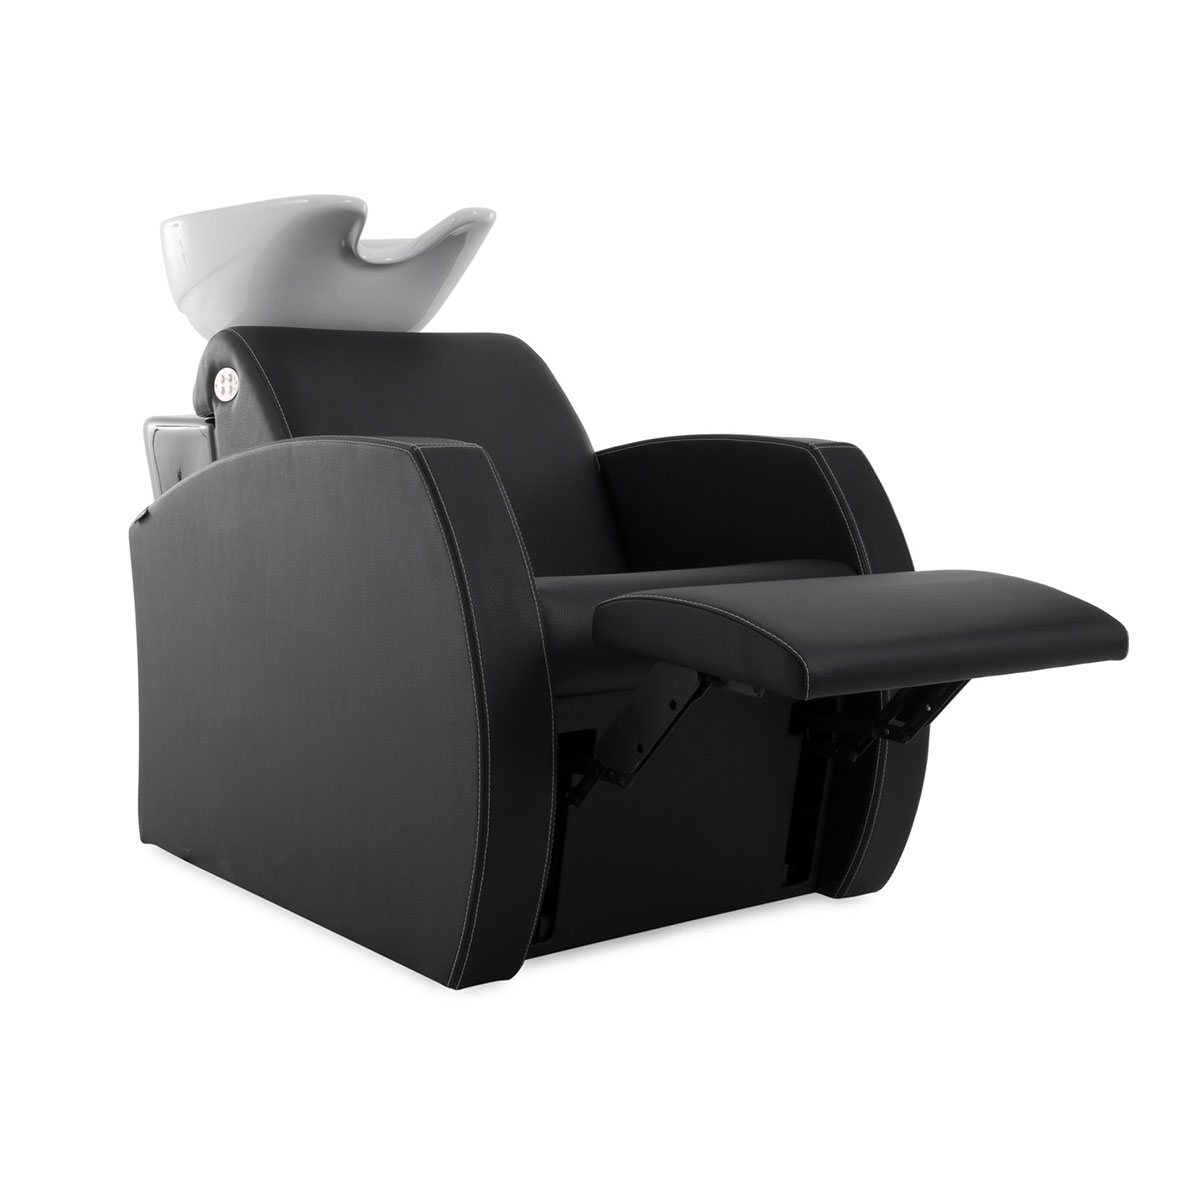 eddmond massage bac de lavage mobicoiff. Black Bedroom Furniture Sets. Home Design Ideas